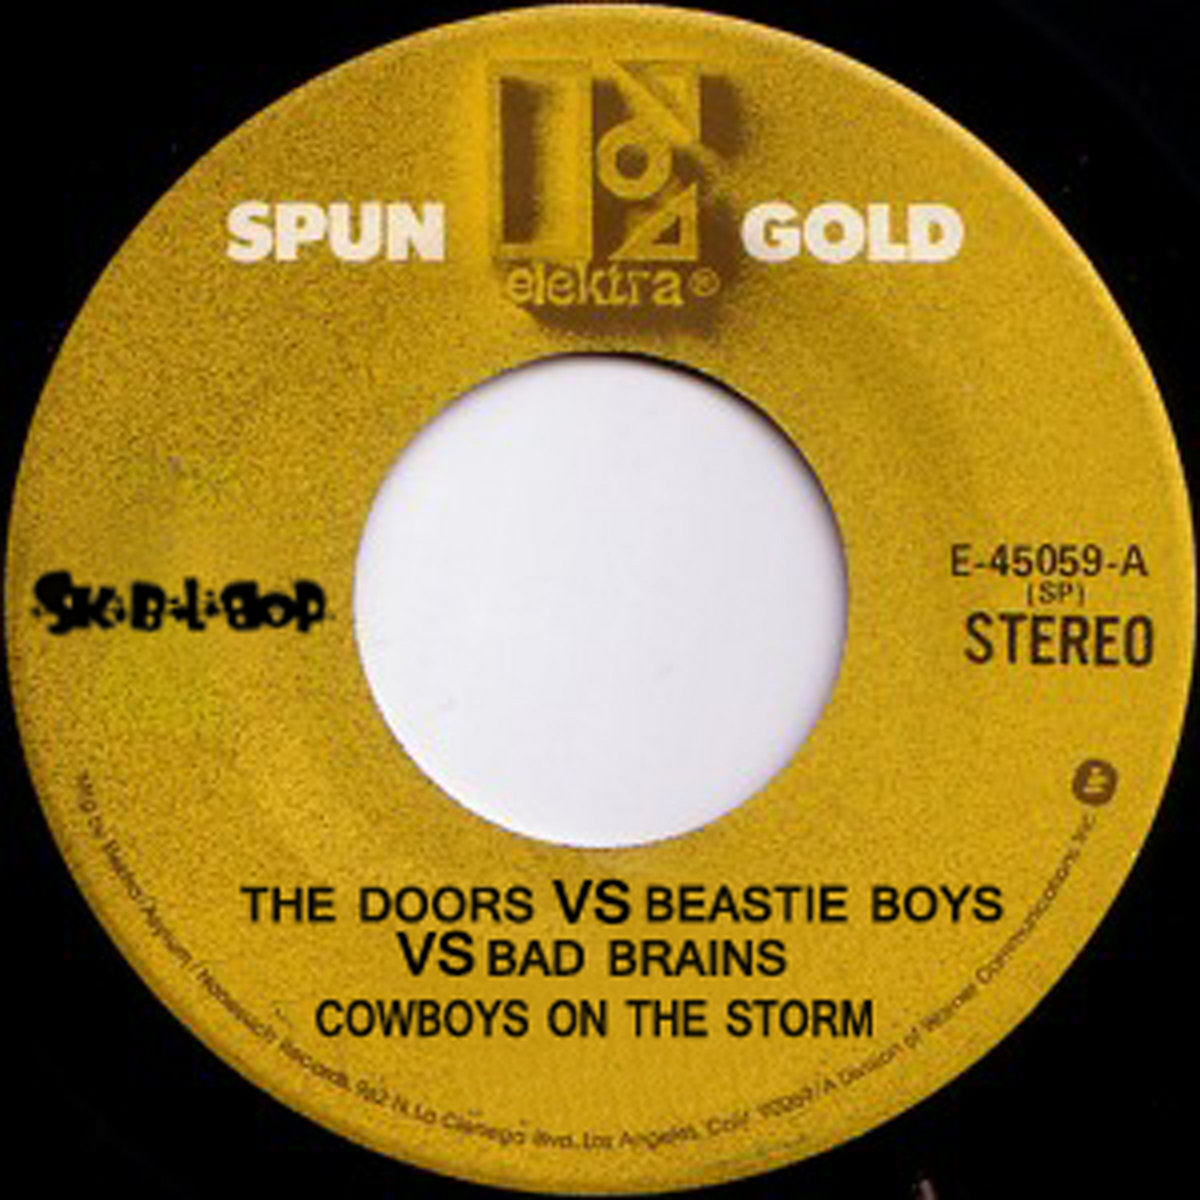 10 Skibilibop Cowboys On The Storm The Doors Vs Beastie Boys Vs